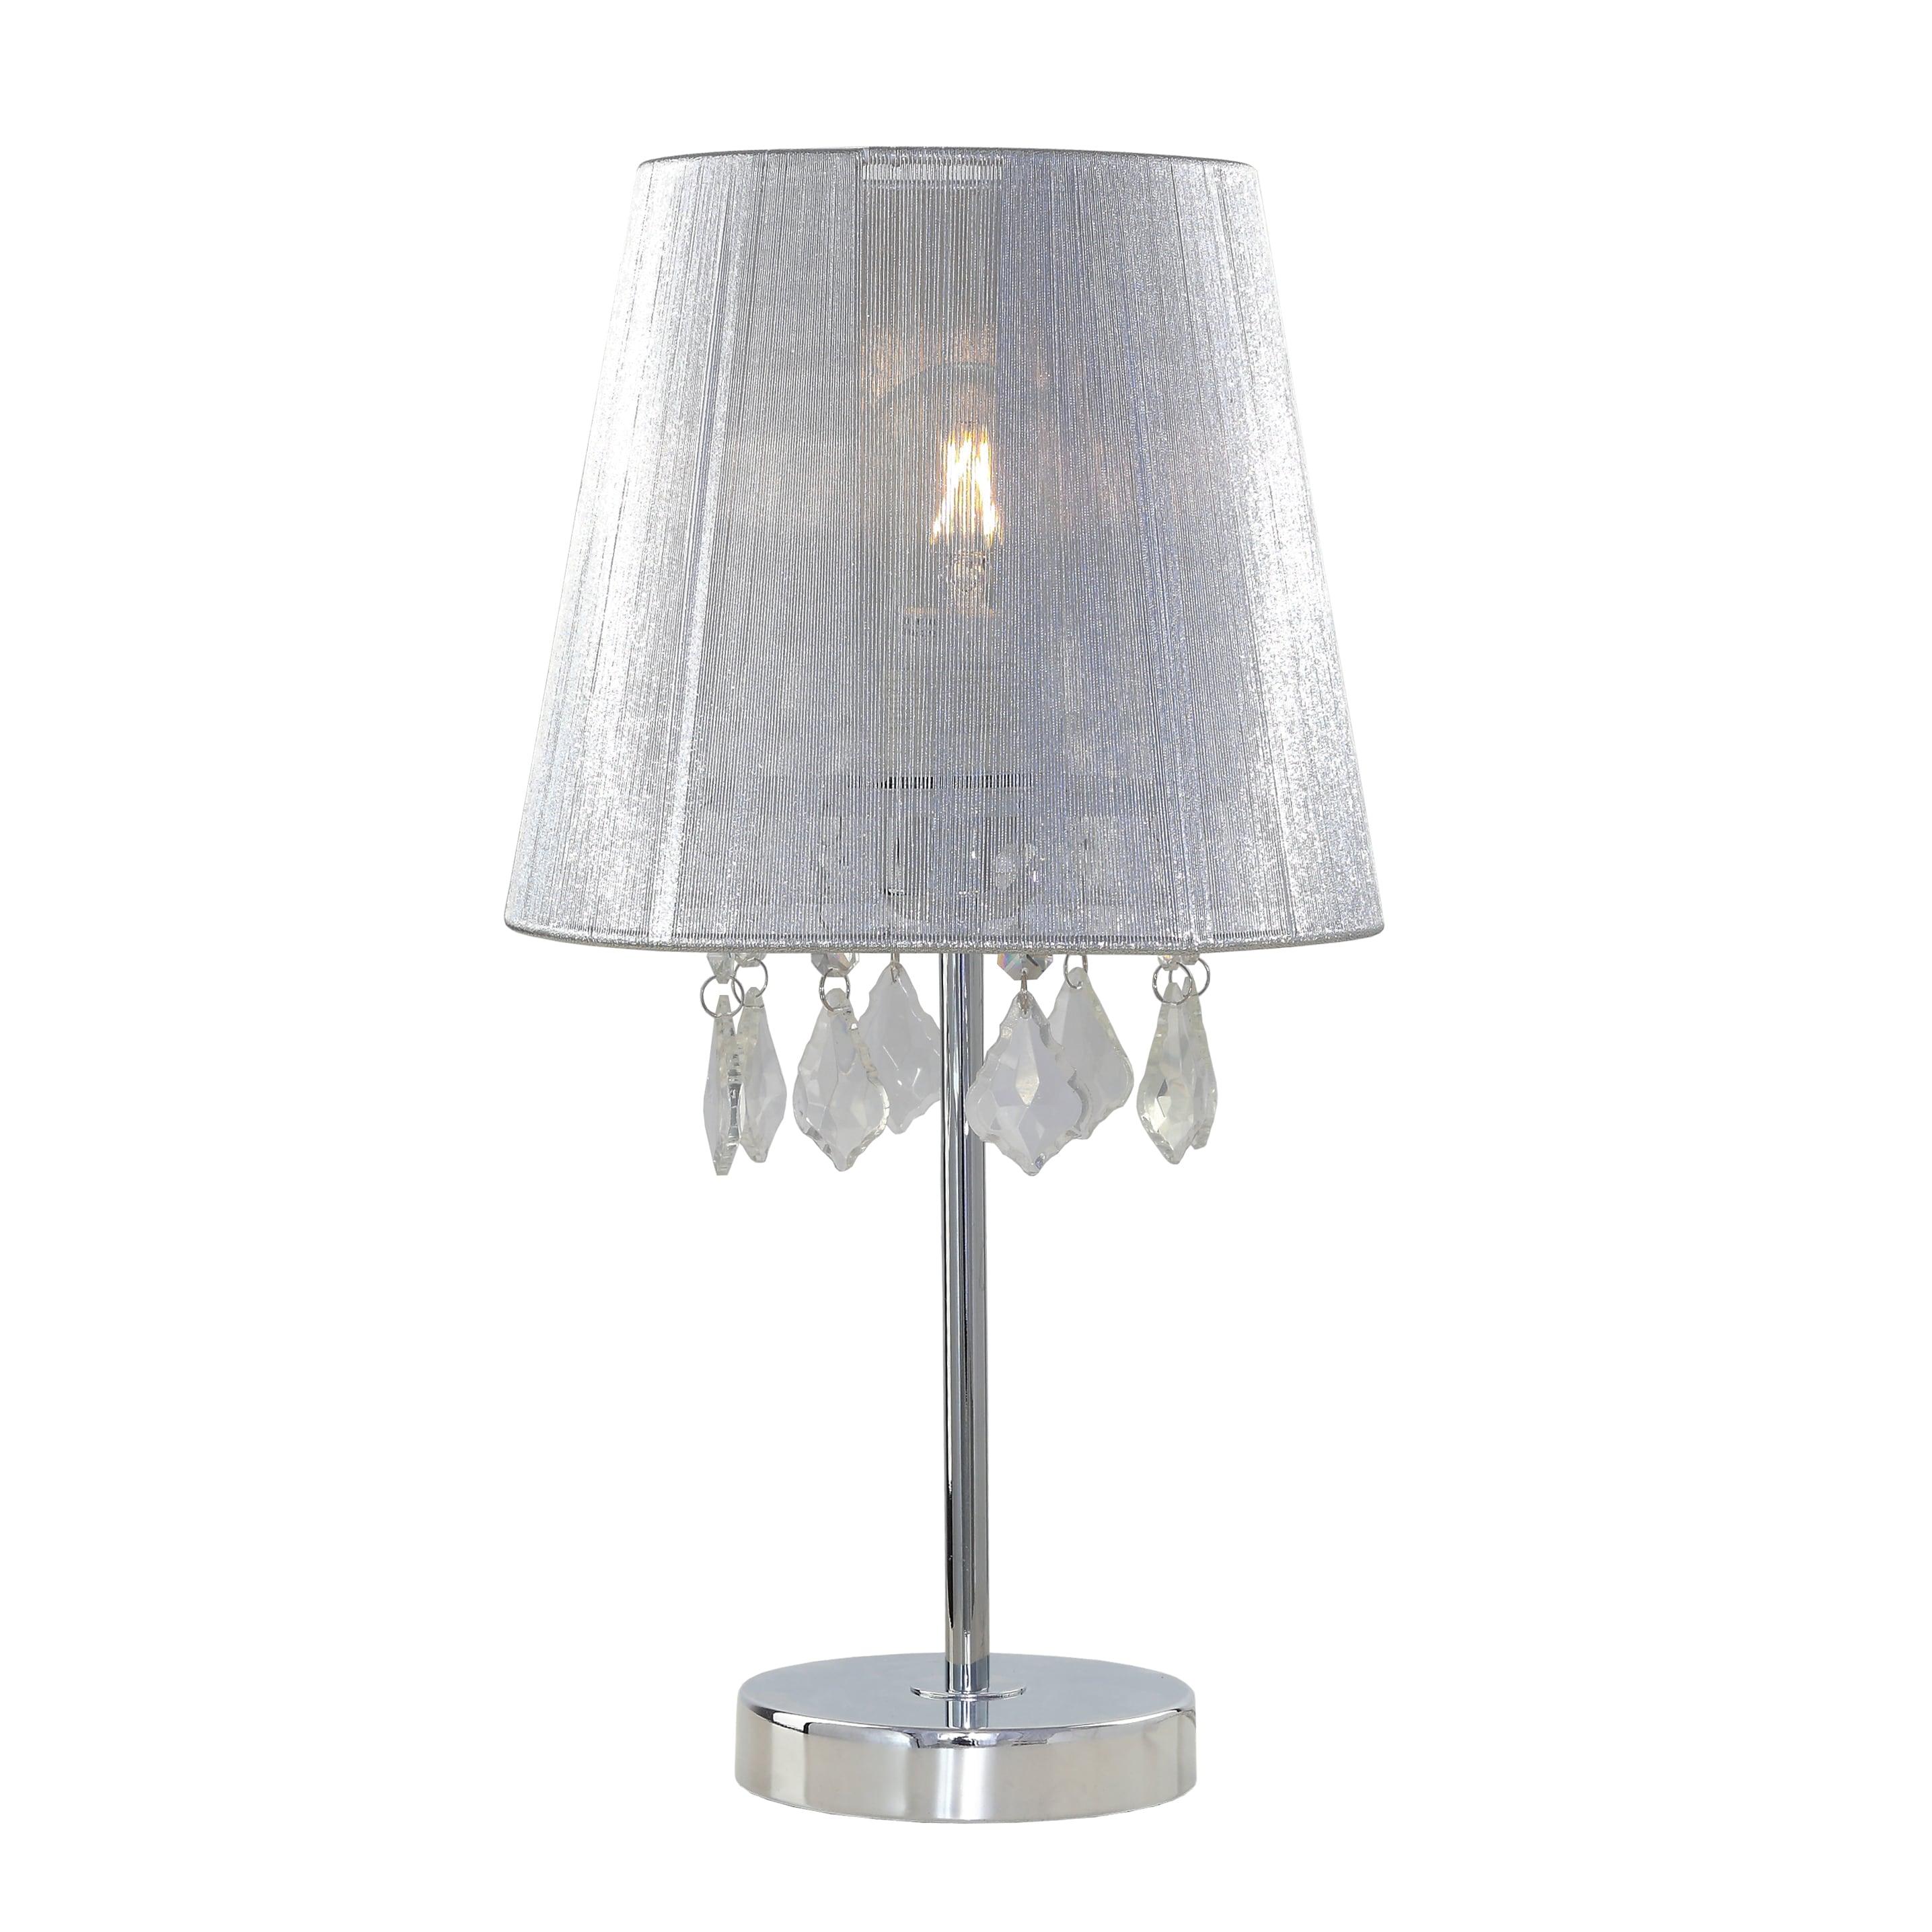 Desk lamp small bright Glamor with diamonds